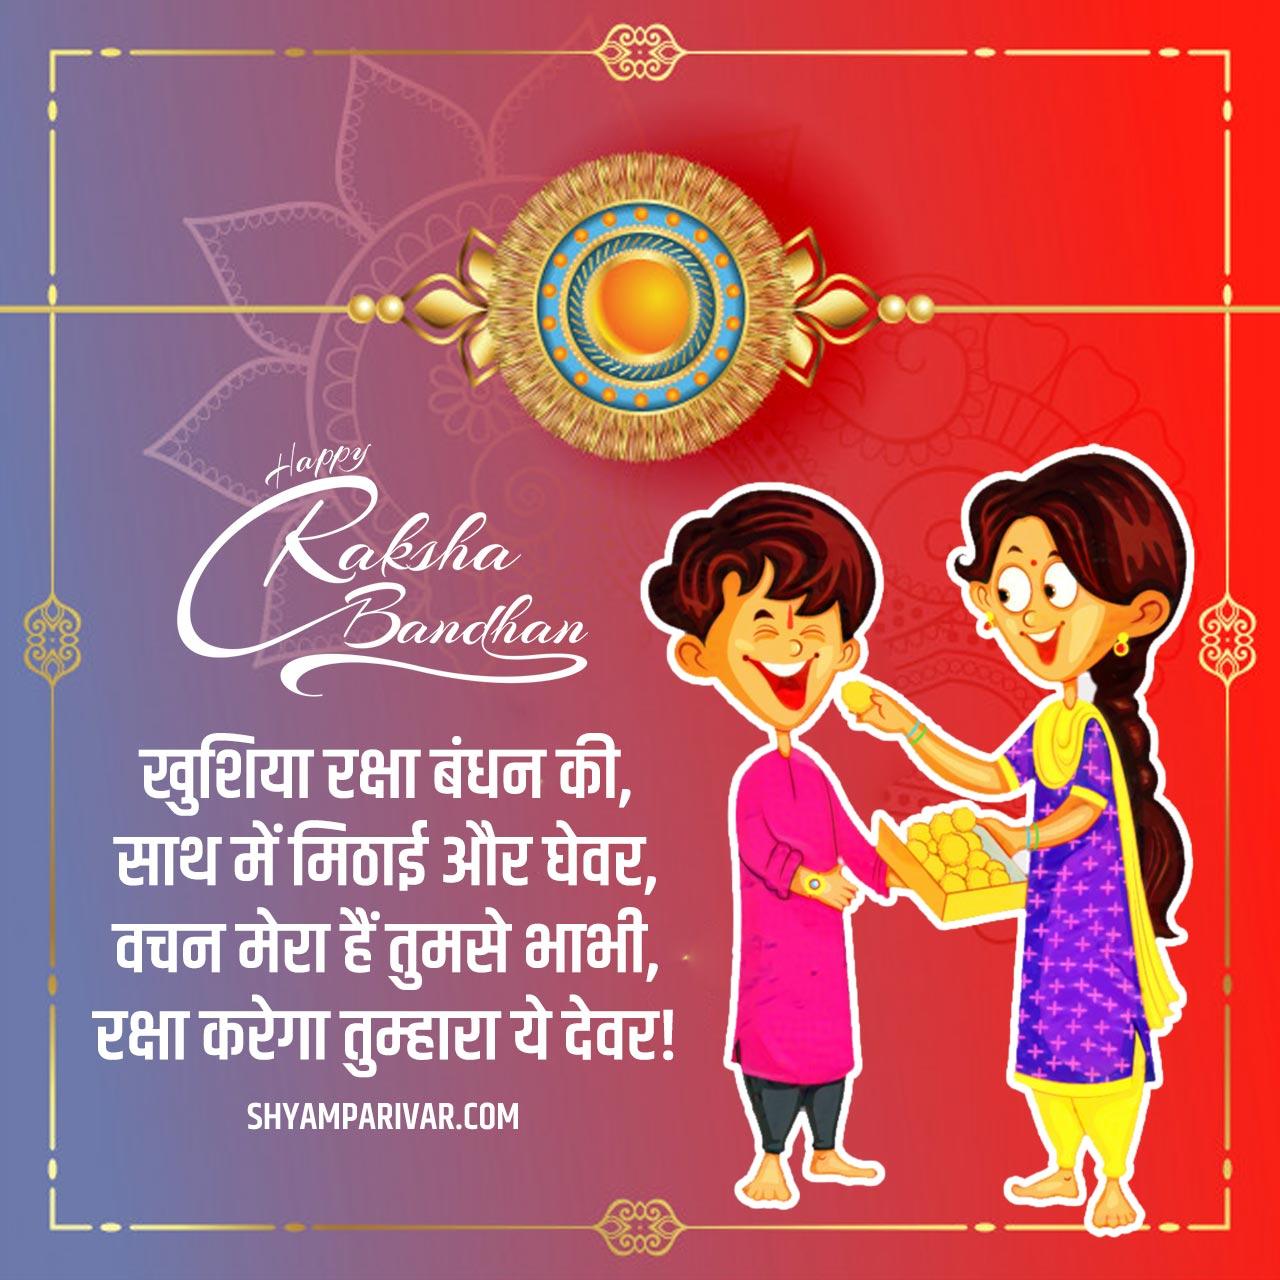 happy raksha bandhan quote hindi with image, रक्षा बंधन स्टेटस